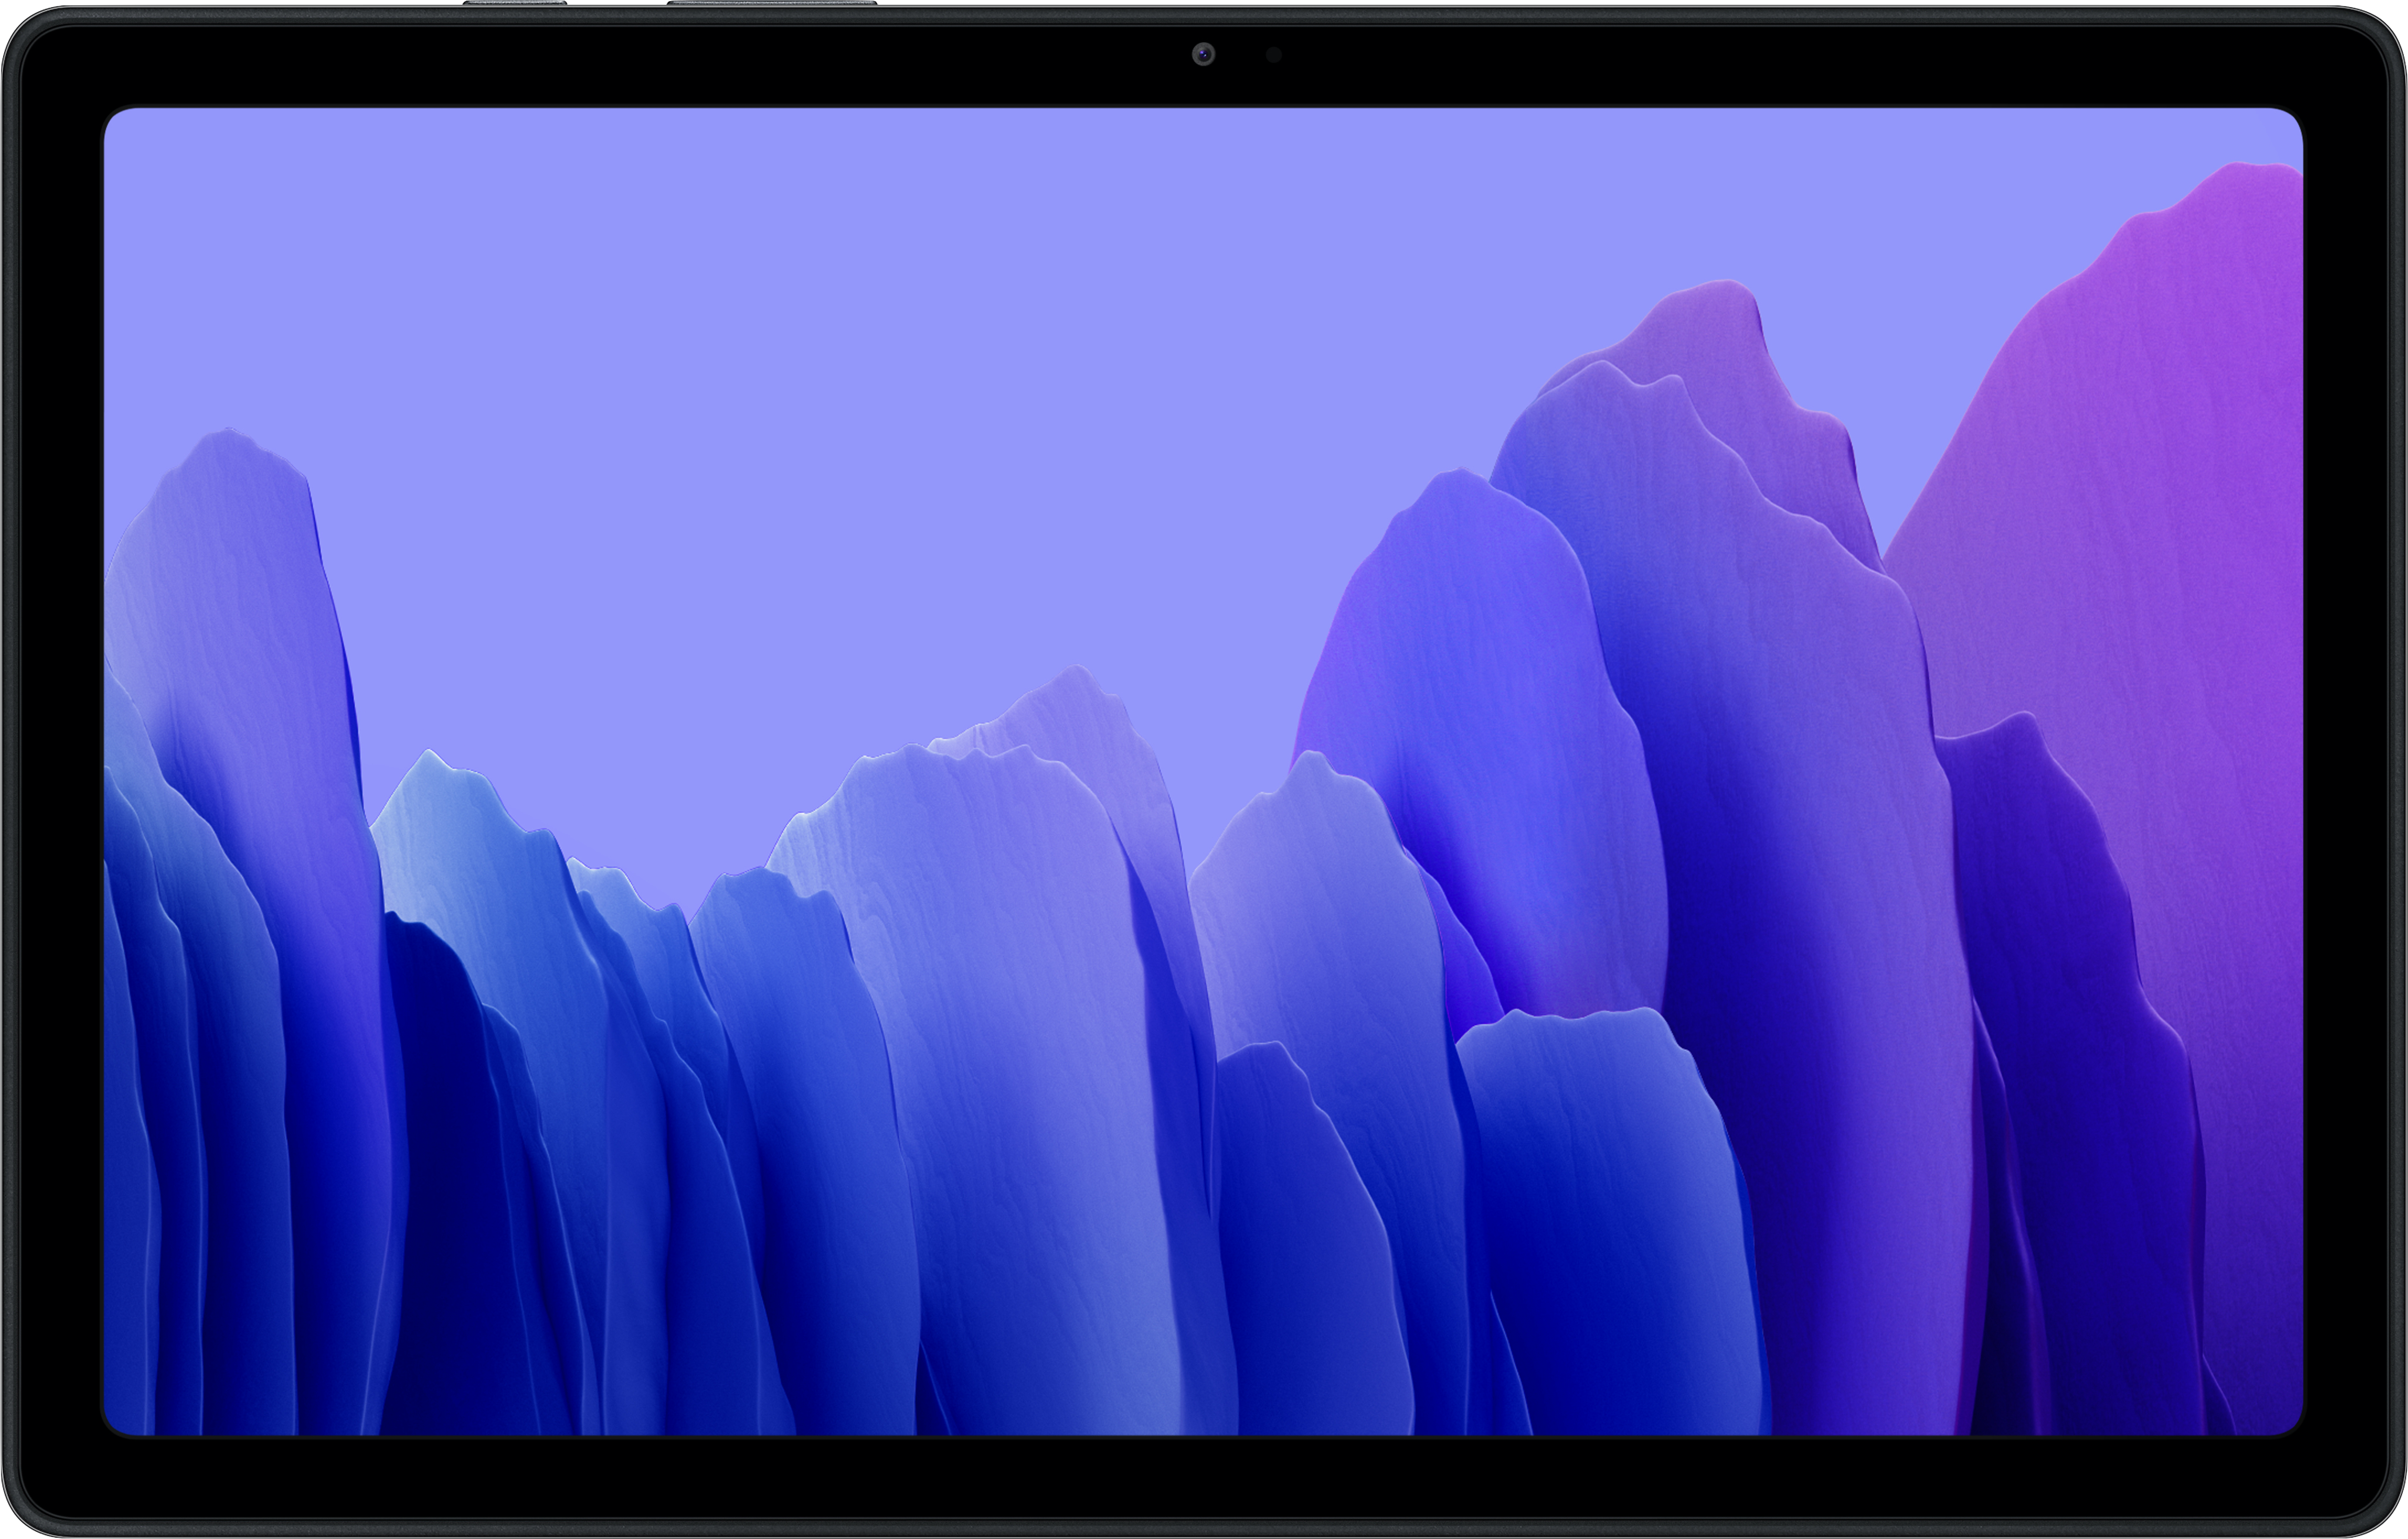 Samsung Tablet Galaxy Tab A7 Lite - Wi-Fi + Cellular - Android™ 11 - 32GB